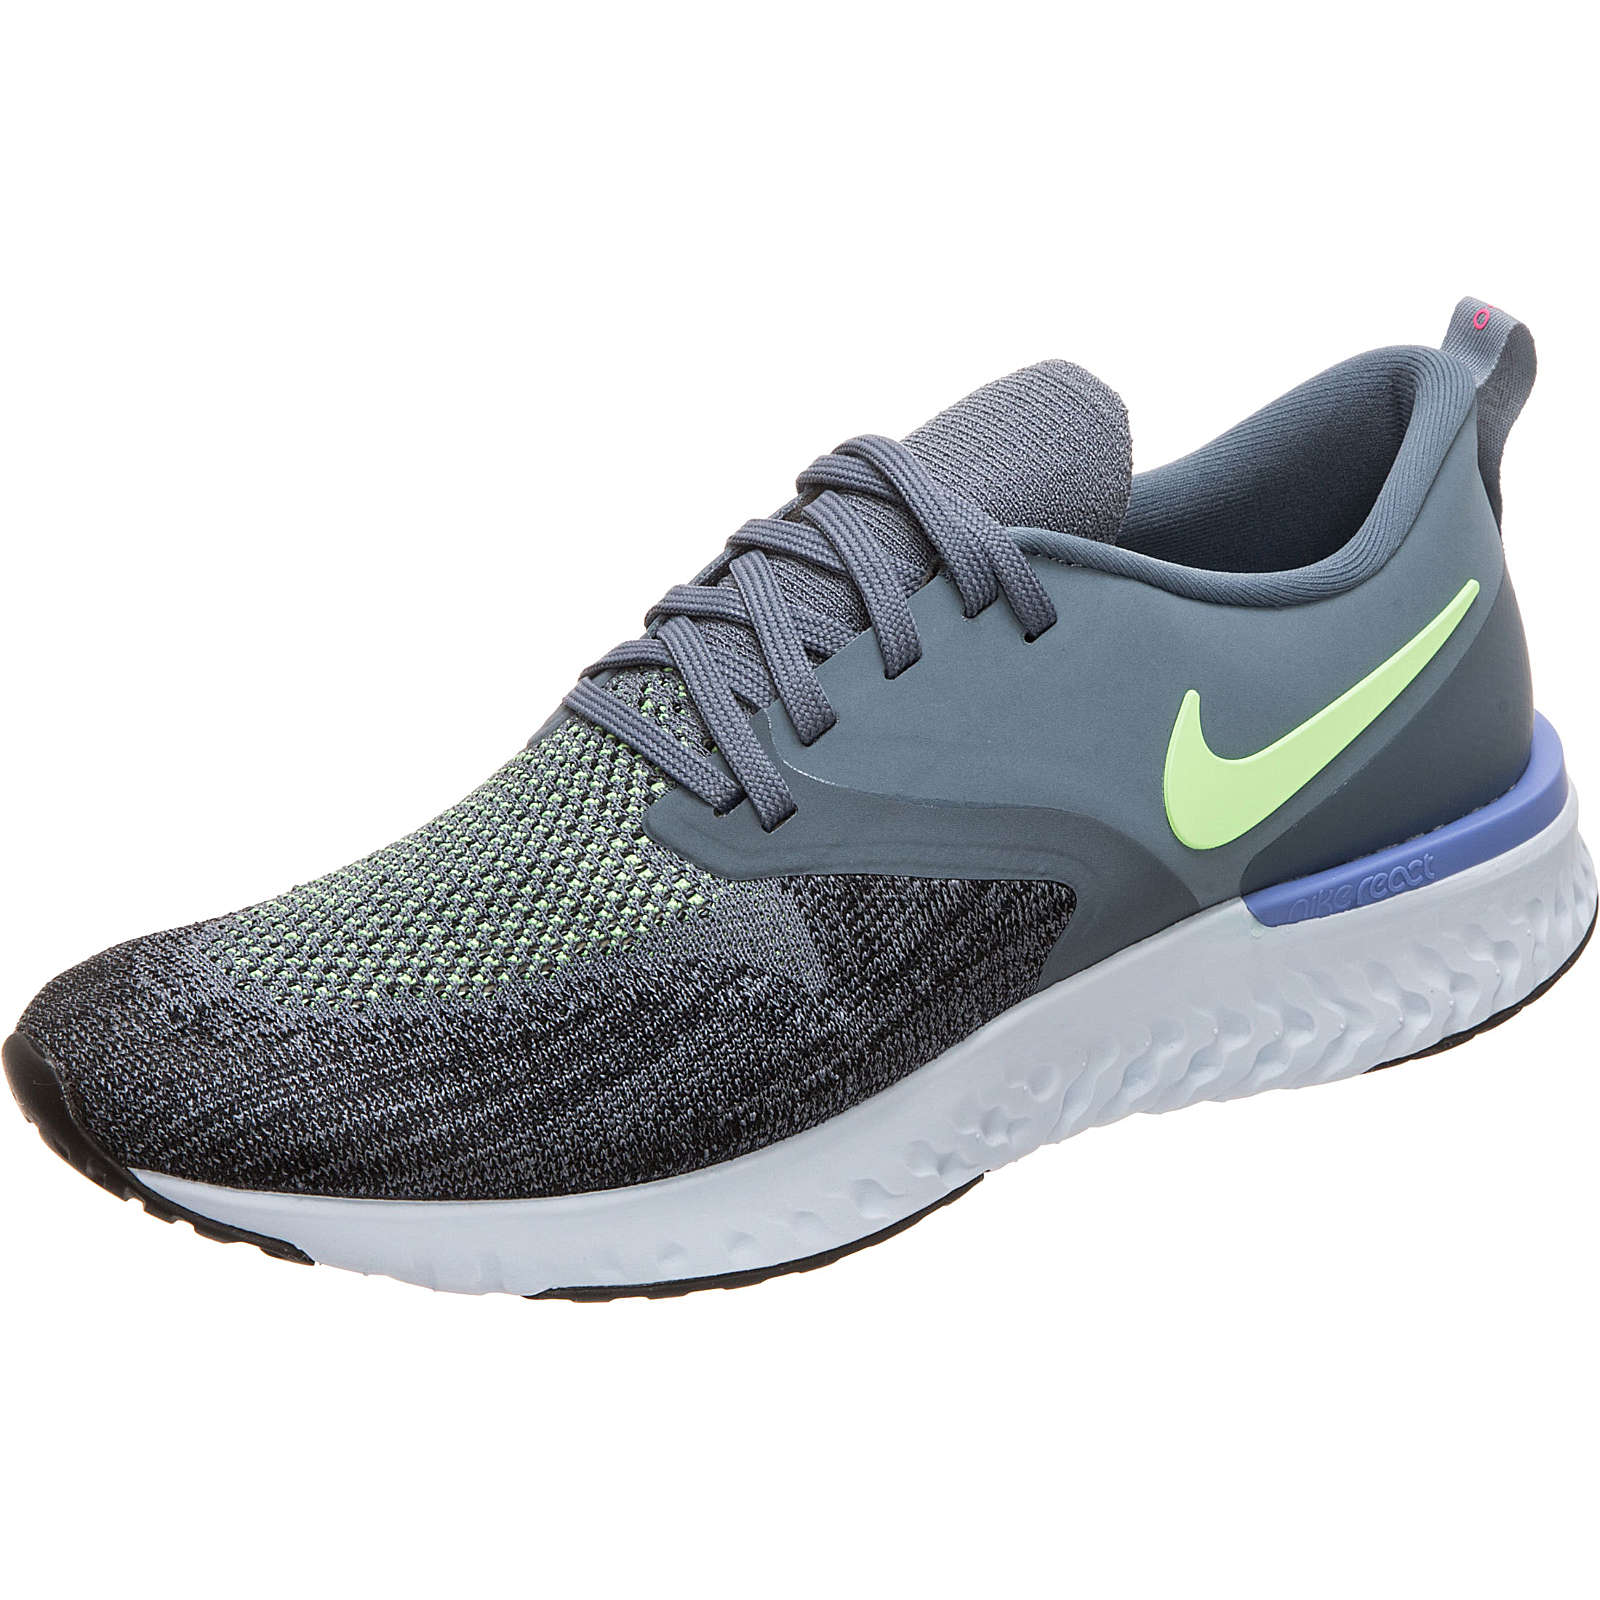 Nike Performance Odyssey React 2 Laufschuh Damen blau/grau Damen Gr. 42